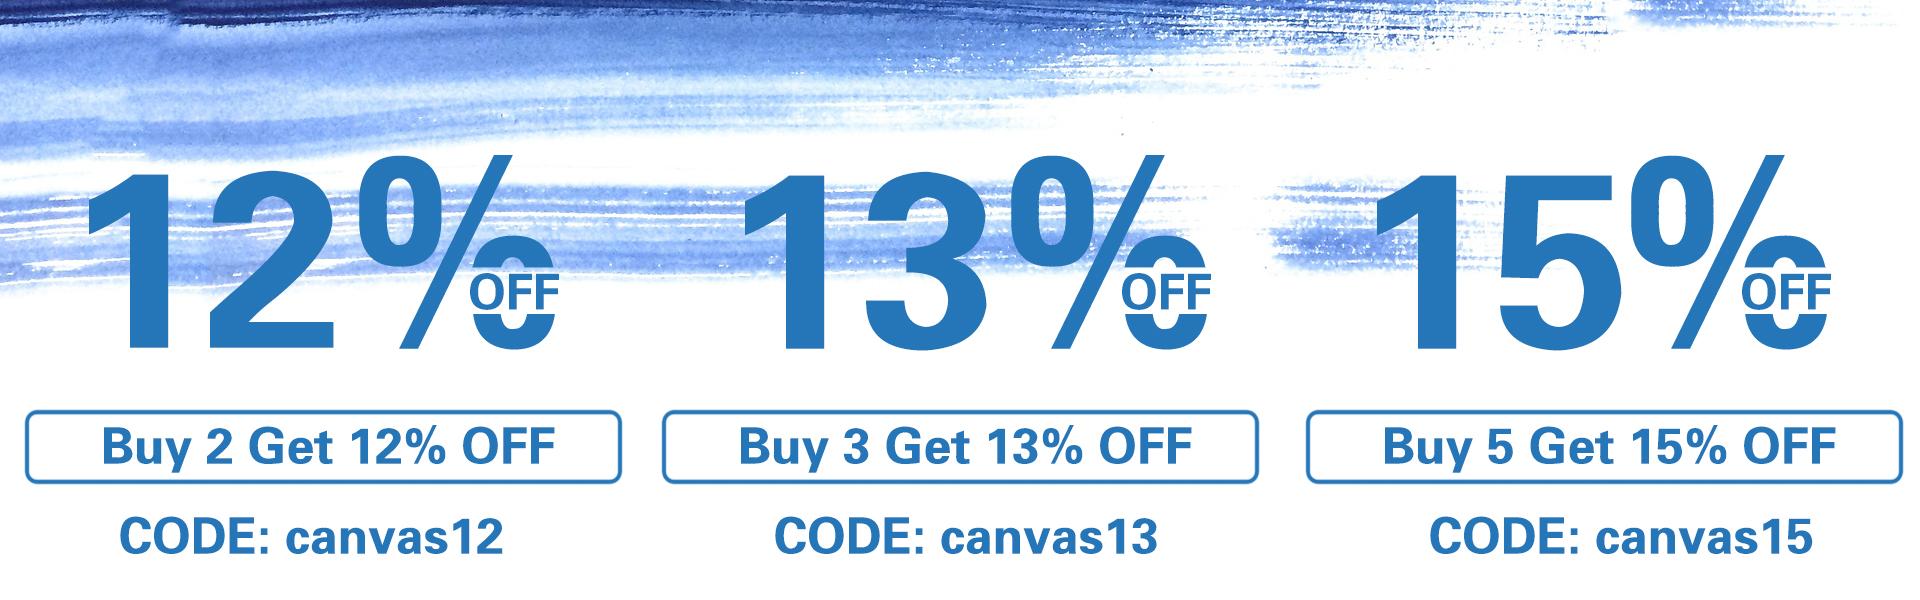 Buy 2 Get 12% OFF, Code: canvas12. Buy 3 Get 13% OFF, Code: canvas13. Buy 5 Get 15% OFF, Code: canvas15.